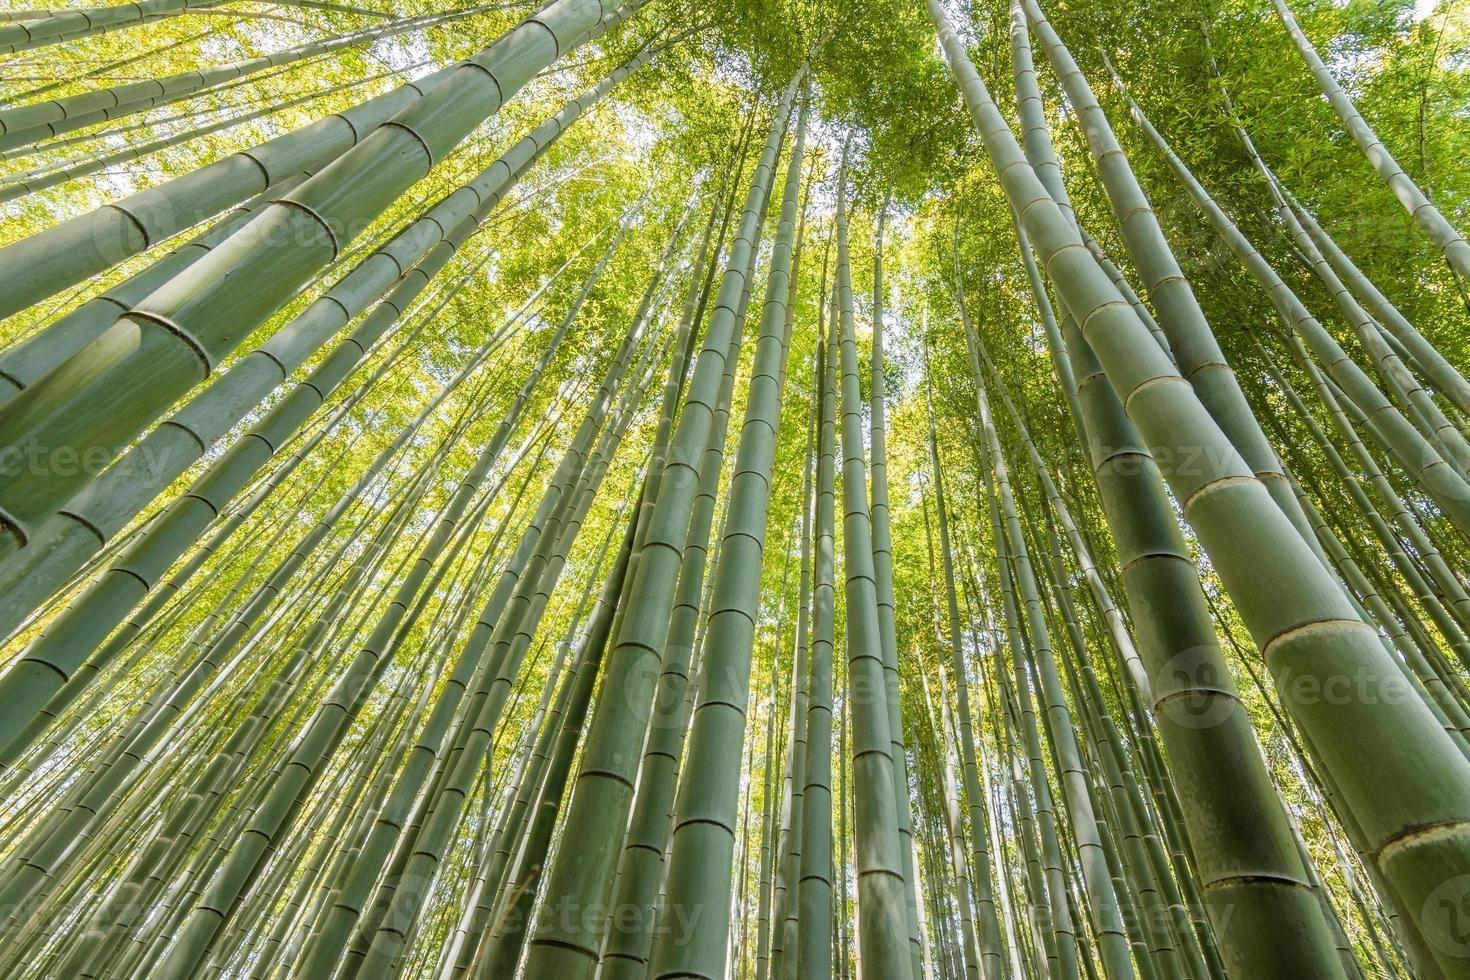 Bamboo forest at Arashiyama photo